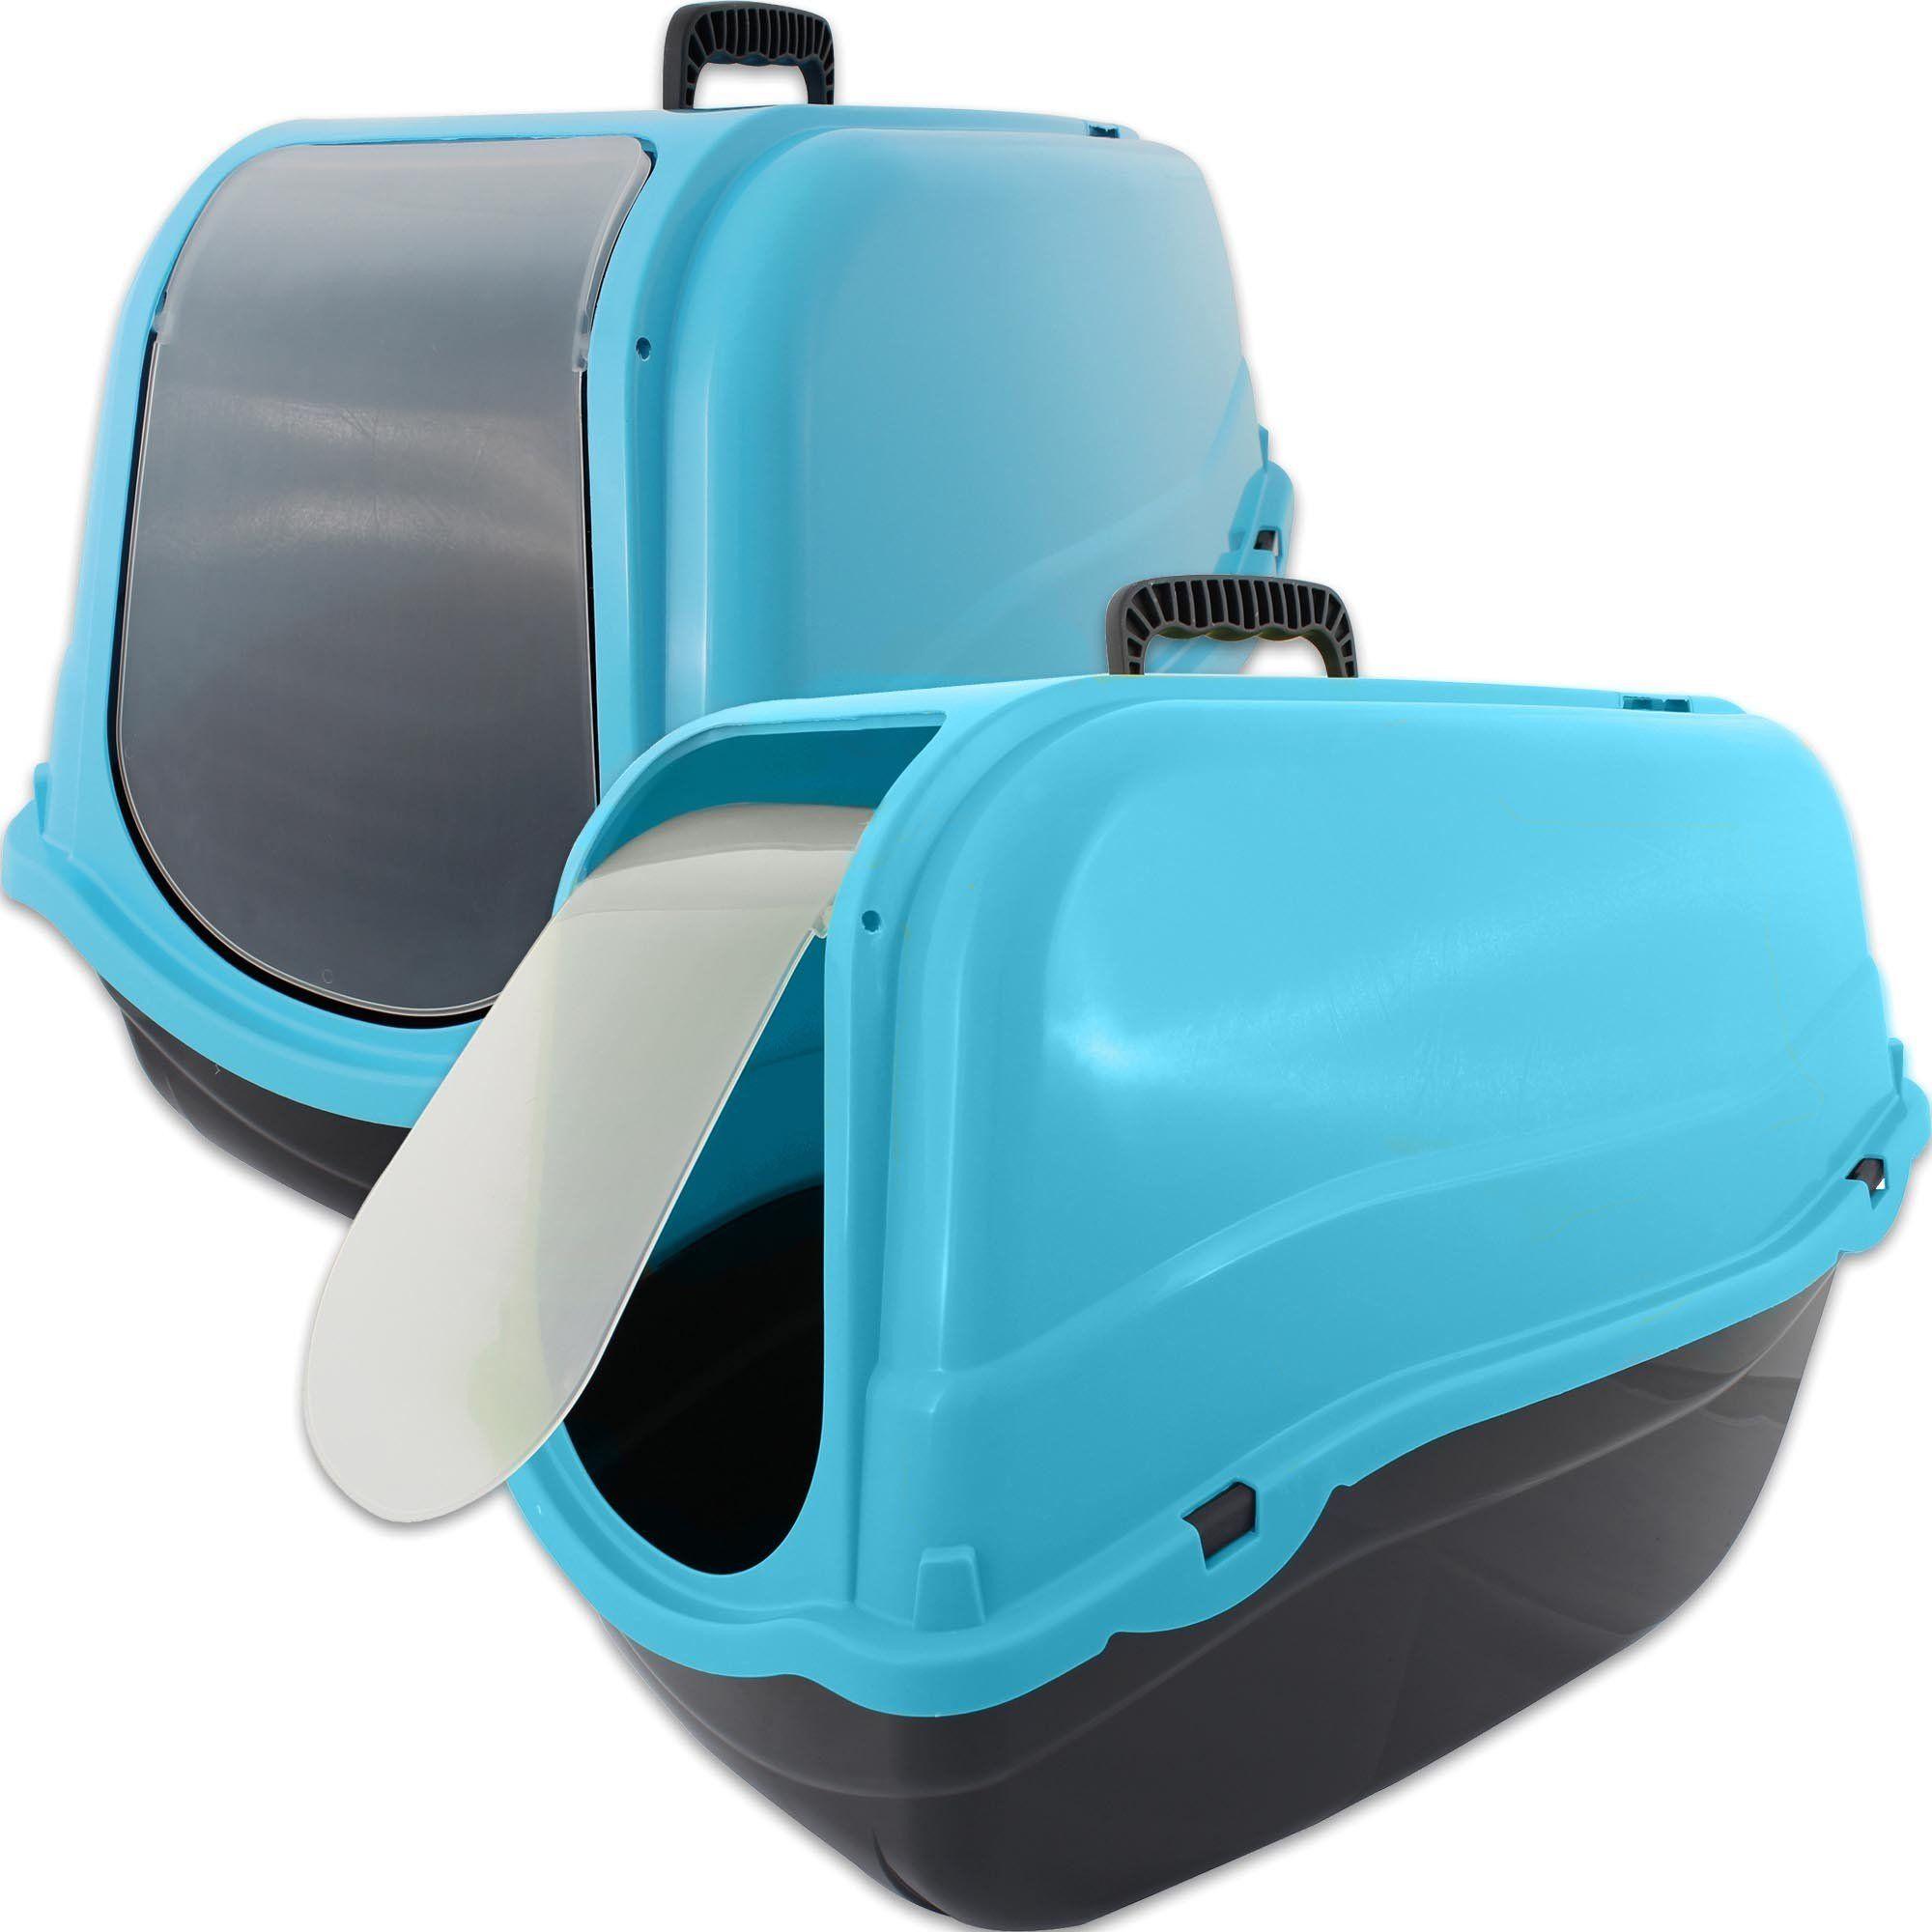 xxl katzentoilette haubentoilette jumbo klo katzenklo filter wc toilette n473 ebay. Black Bedroom Furniture Sets. Home Design Ideas